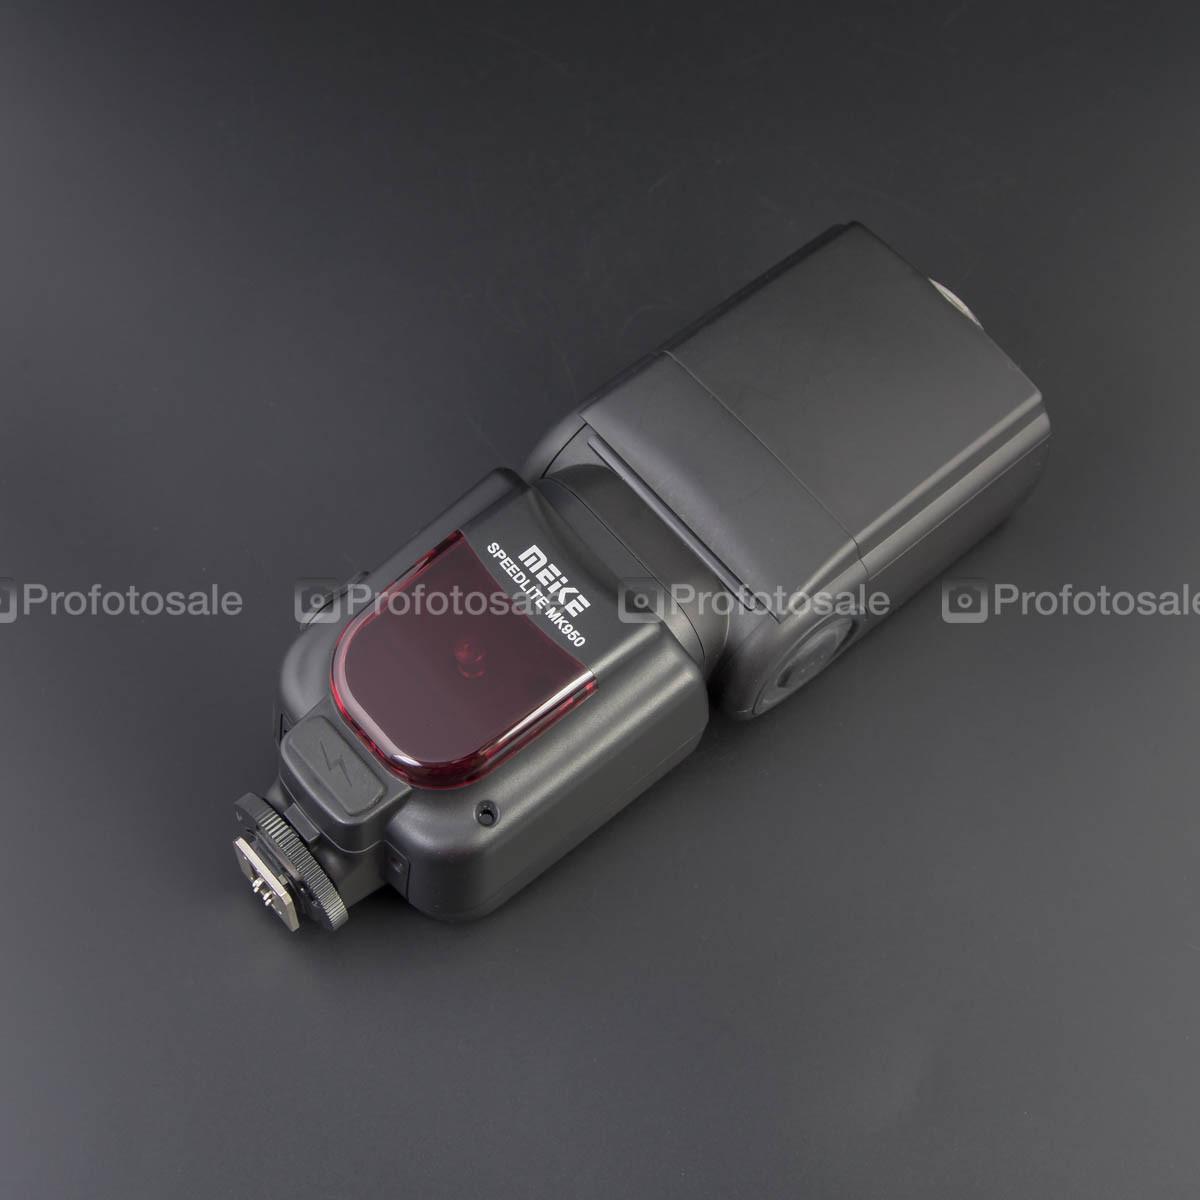 Фотовспышка Meke Speedlite MK950 для Canon